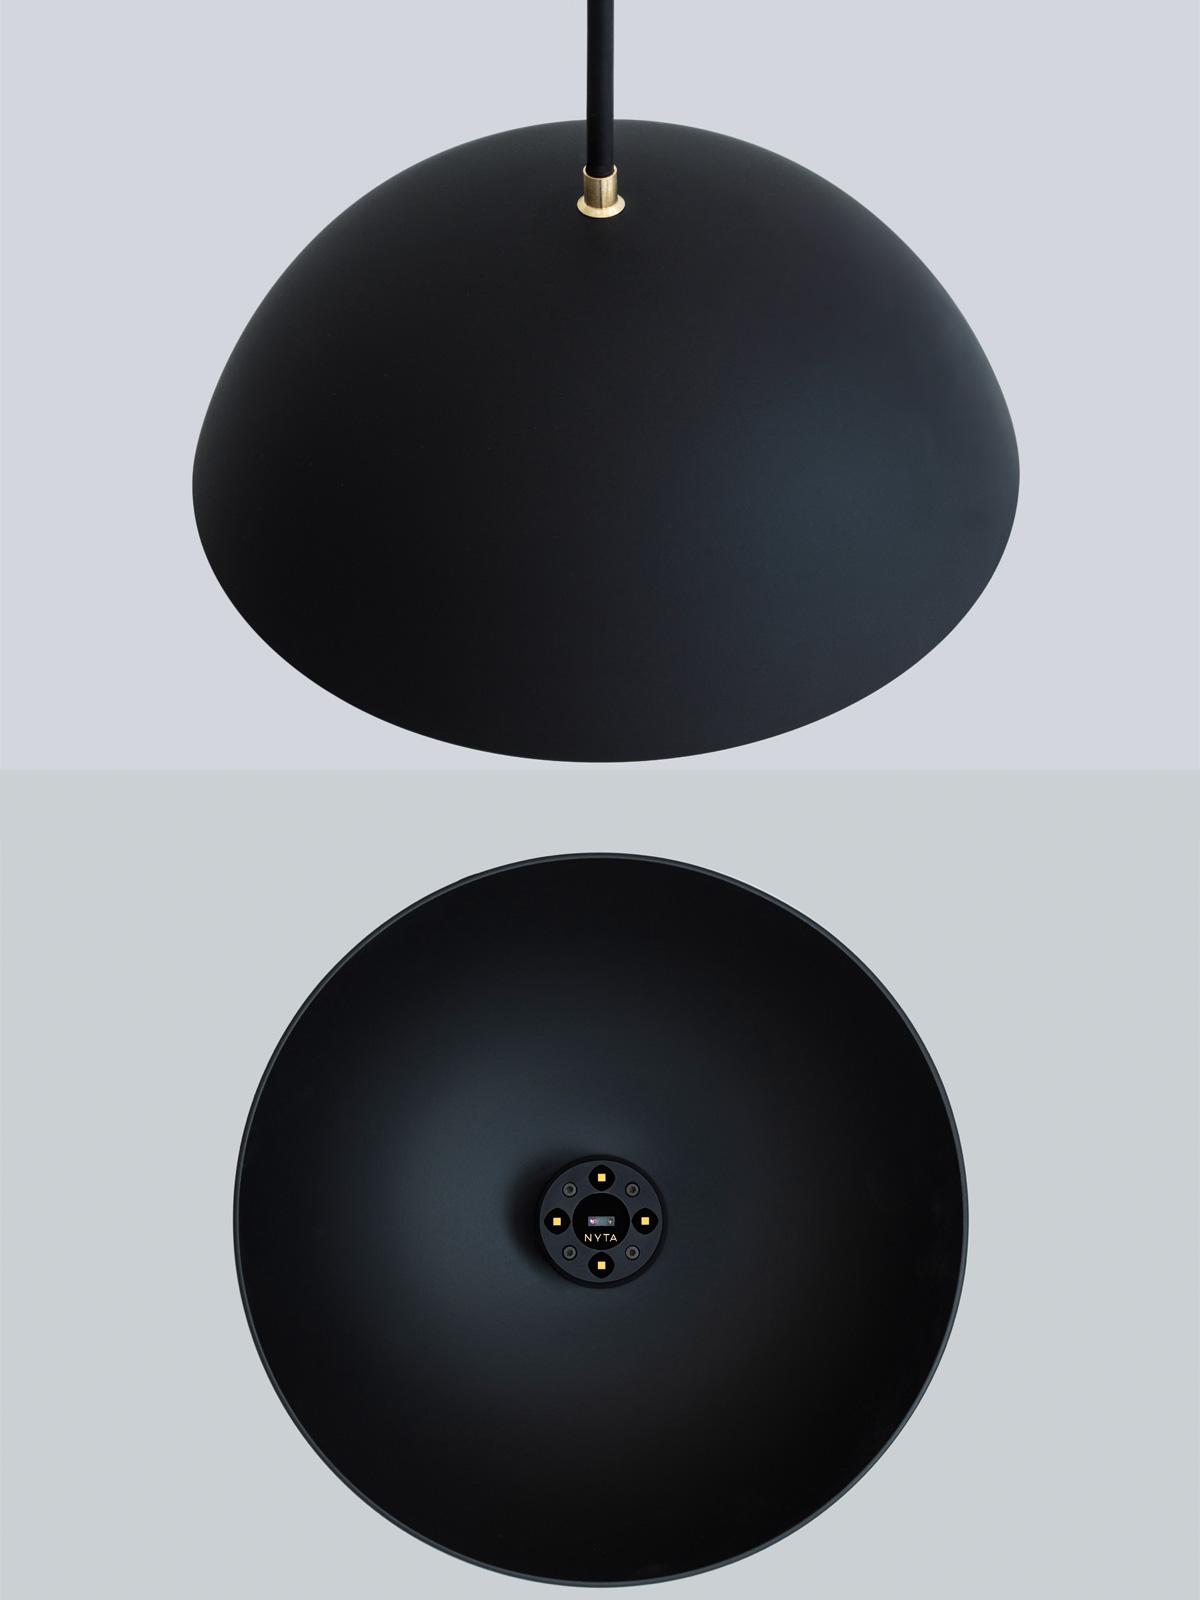 Pong Leuchte NYTA DesignOrt Onlineshop Lampen Berlin